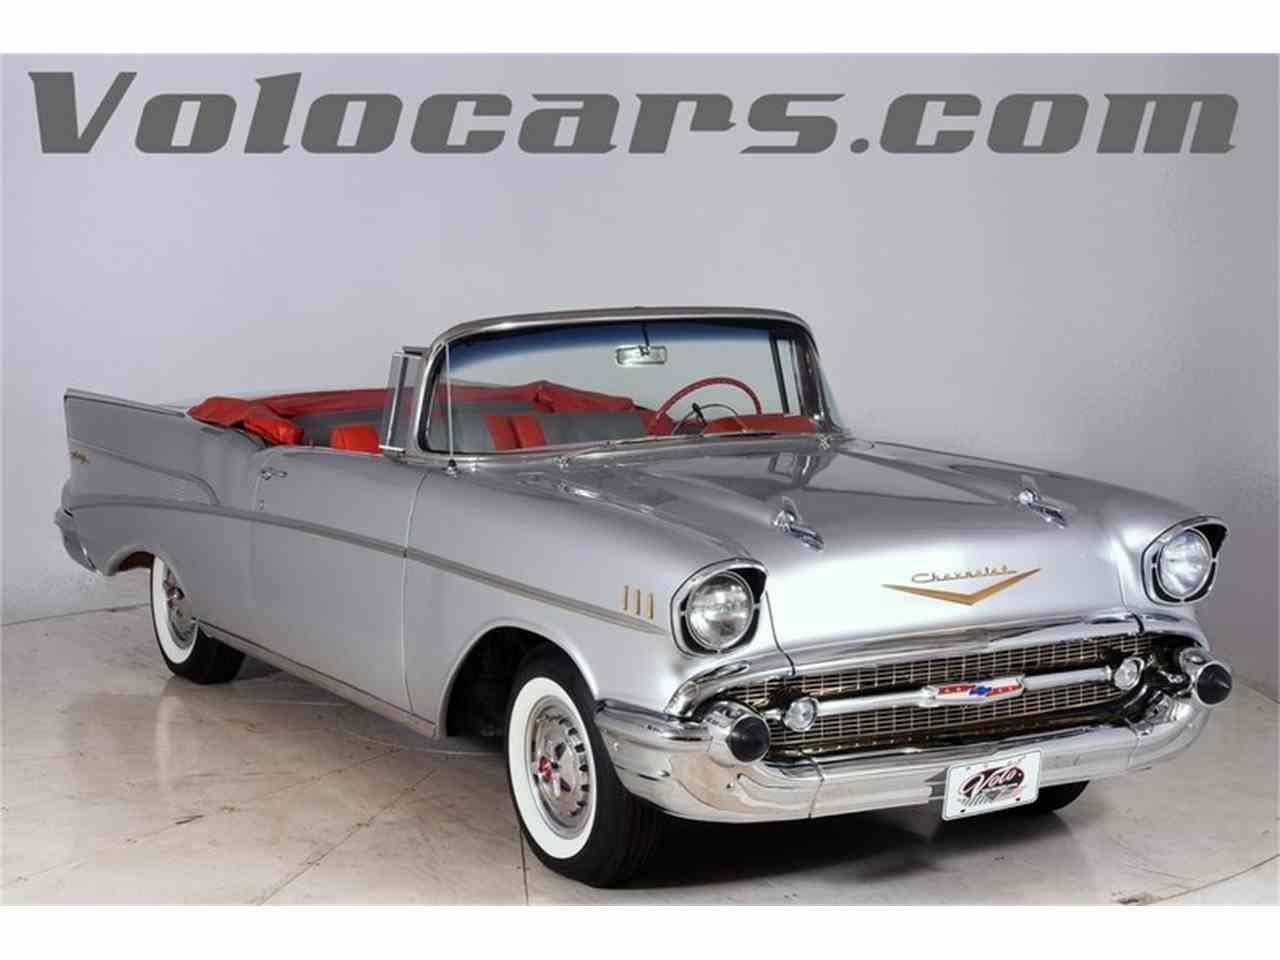 1957 Chevrolet Bel Air for Sale - CC-1020879